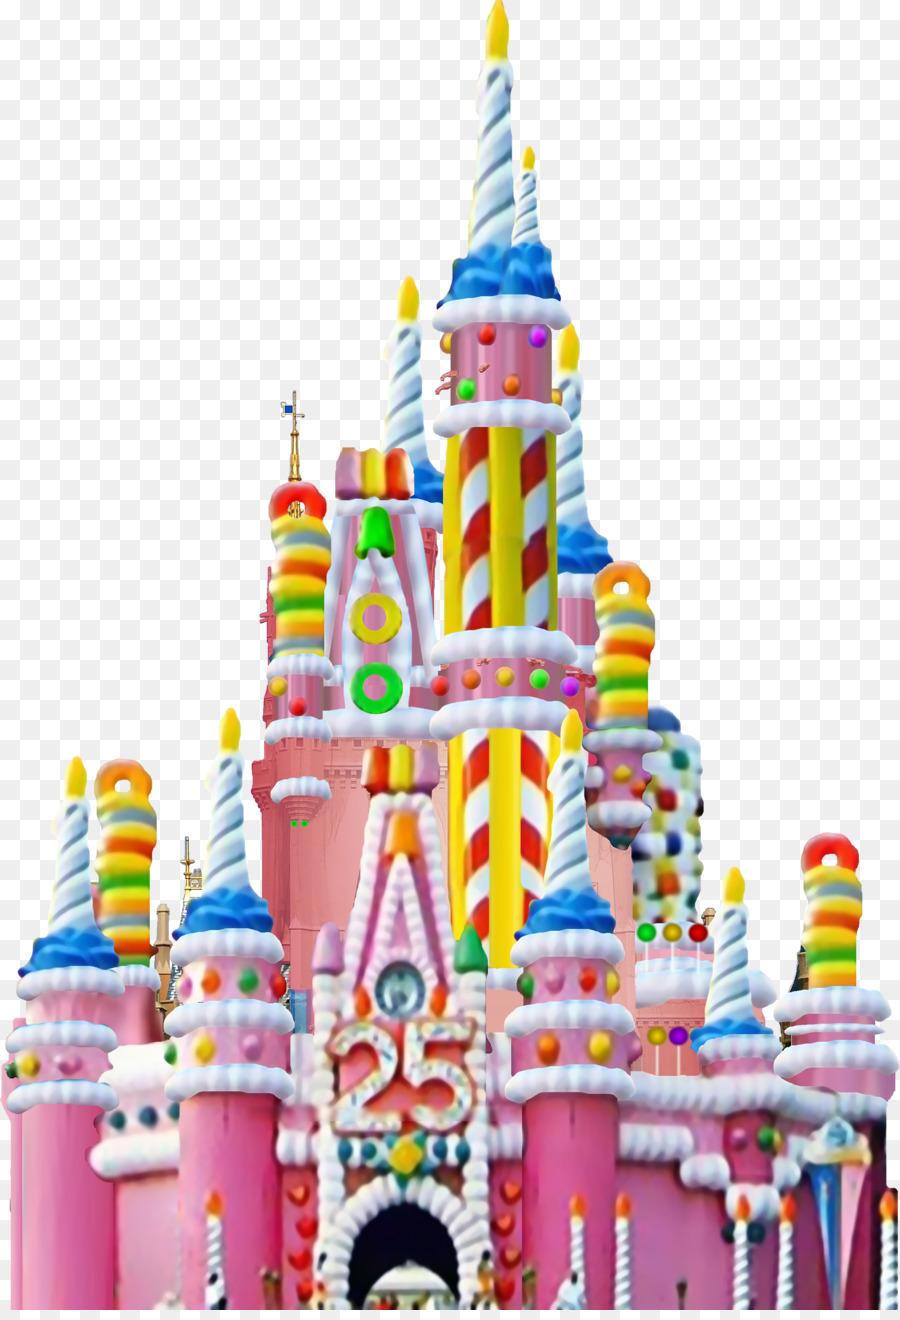 Magic Kingdom Disneyland Paris Sleeping Beauty Castle Cinderella